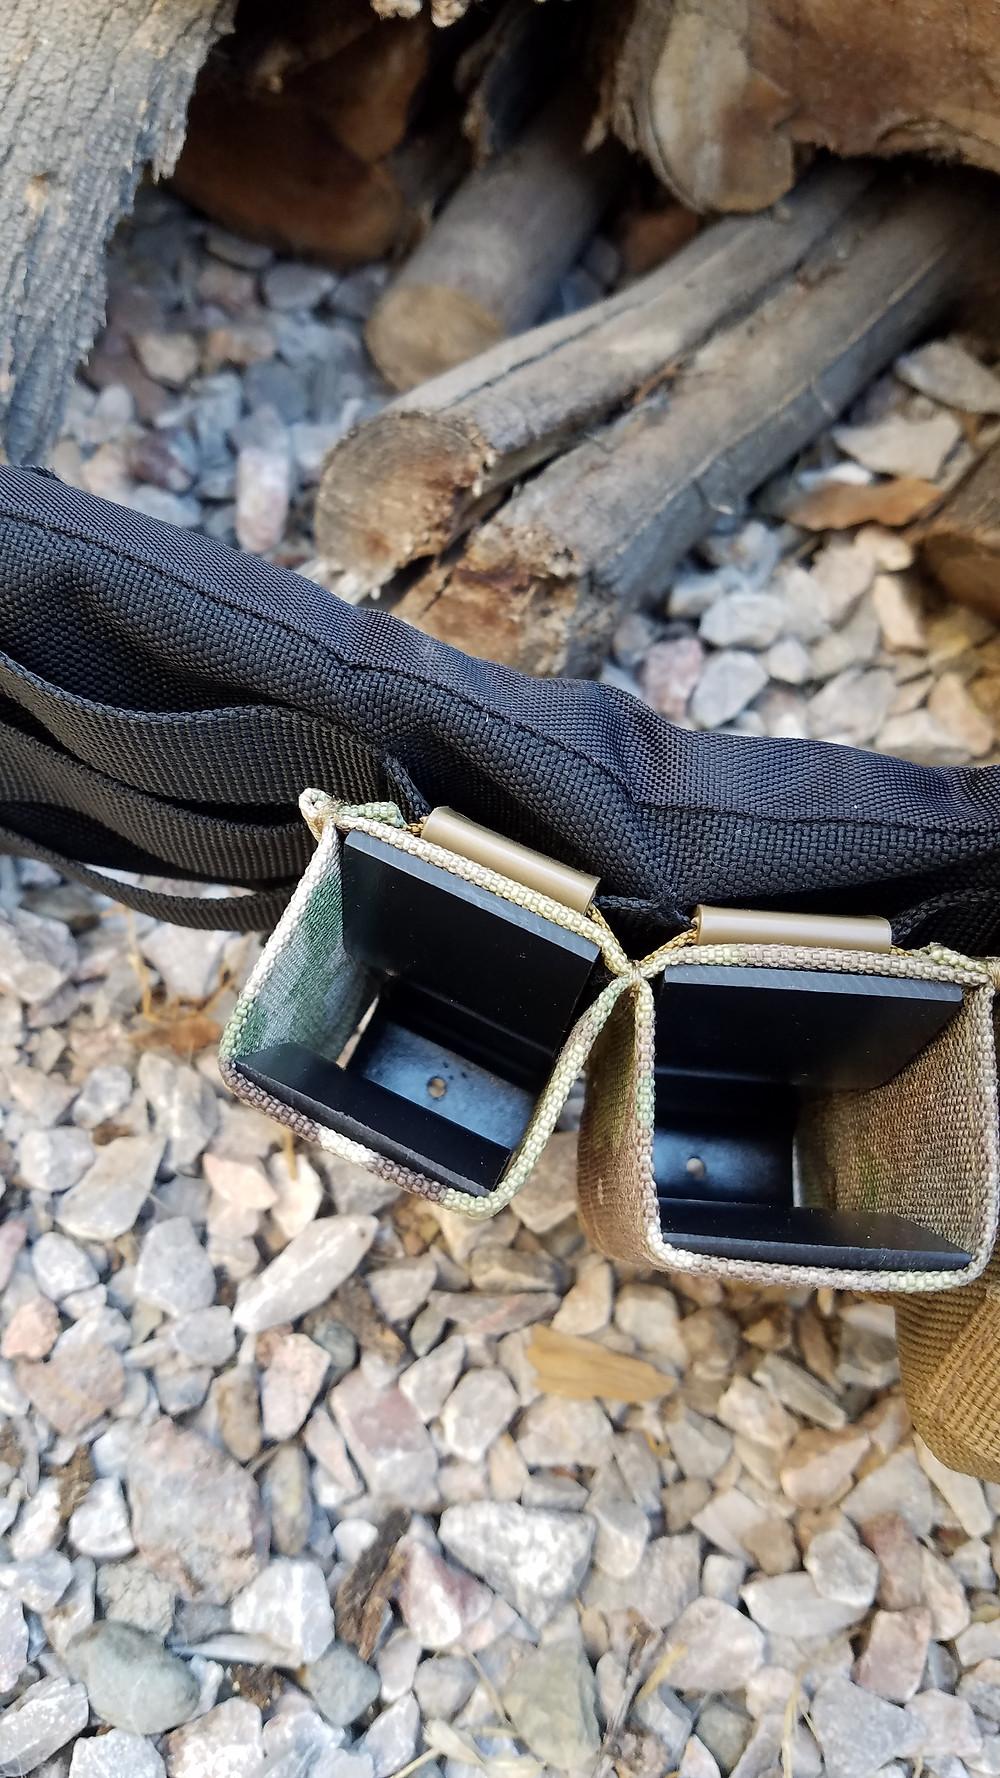 esstac kywi pistol mag inserts